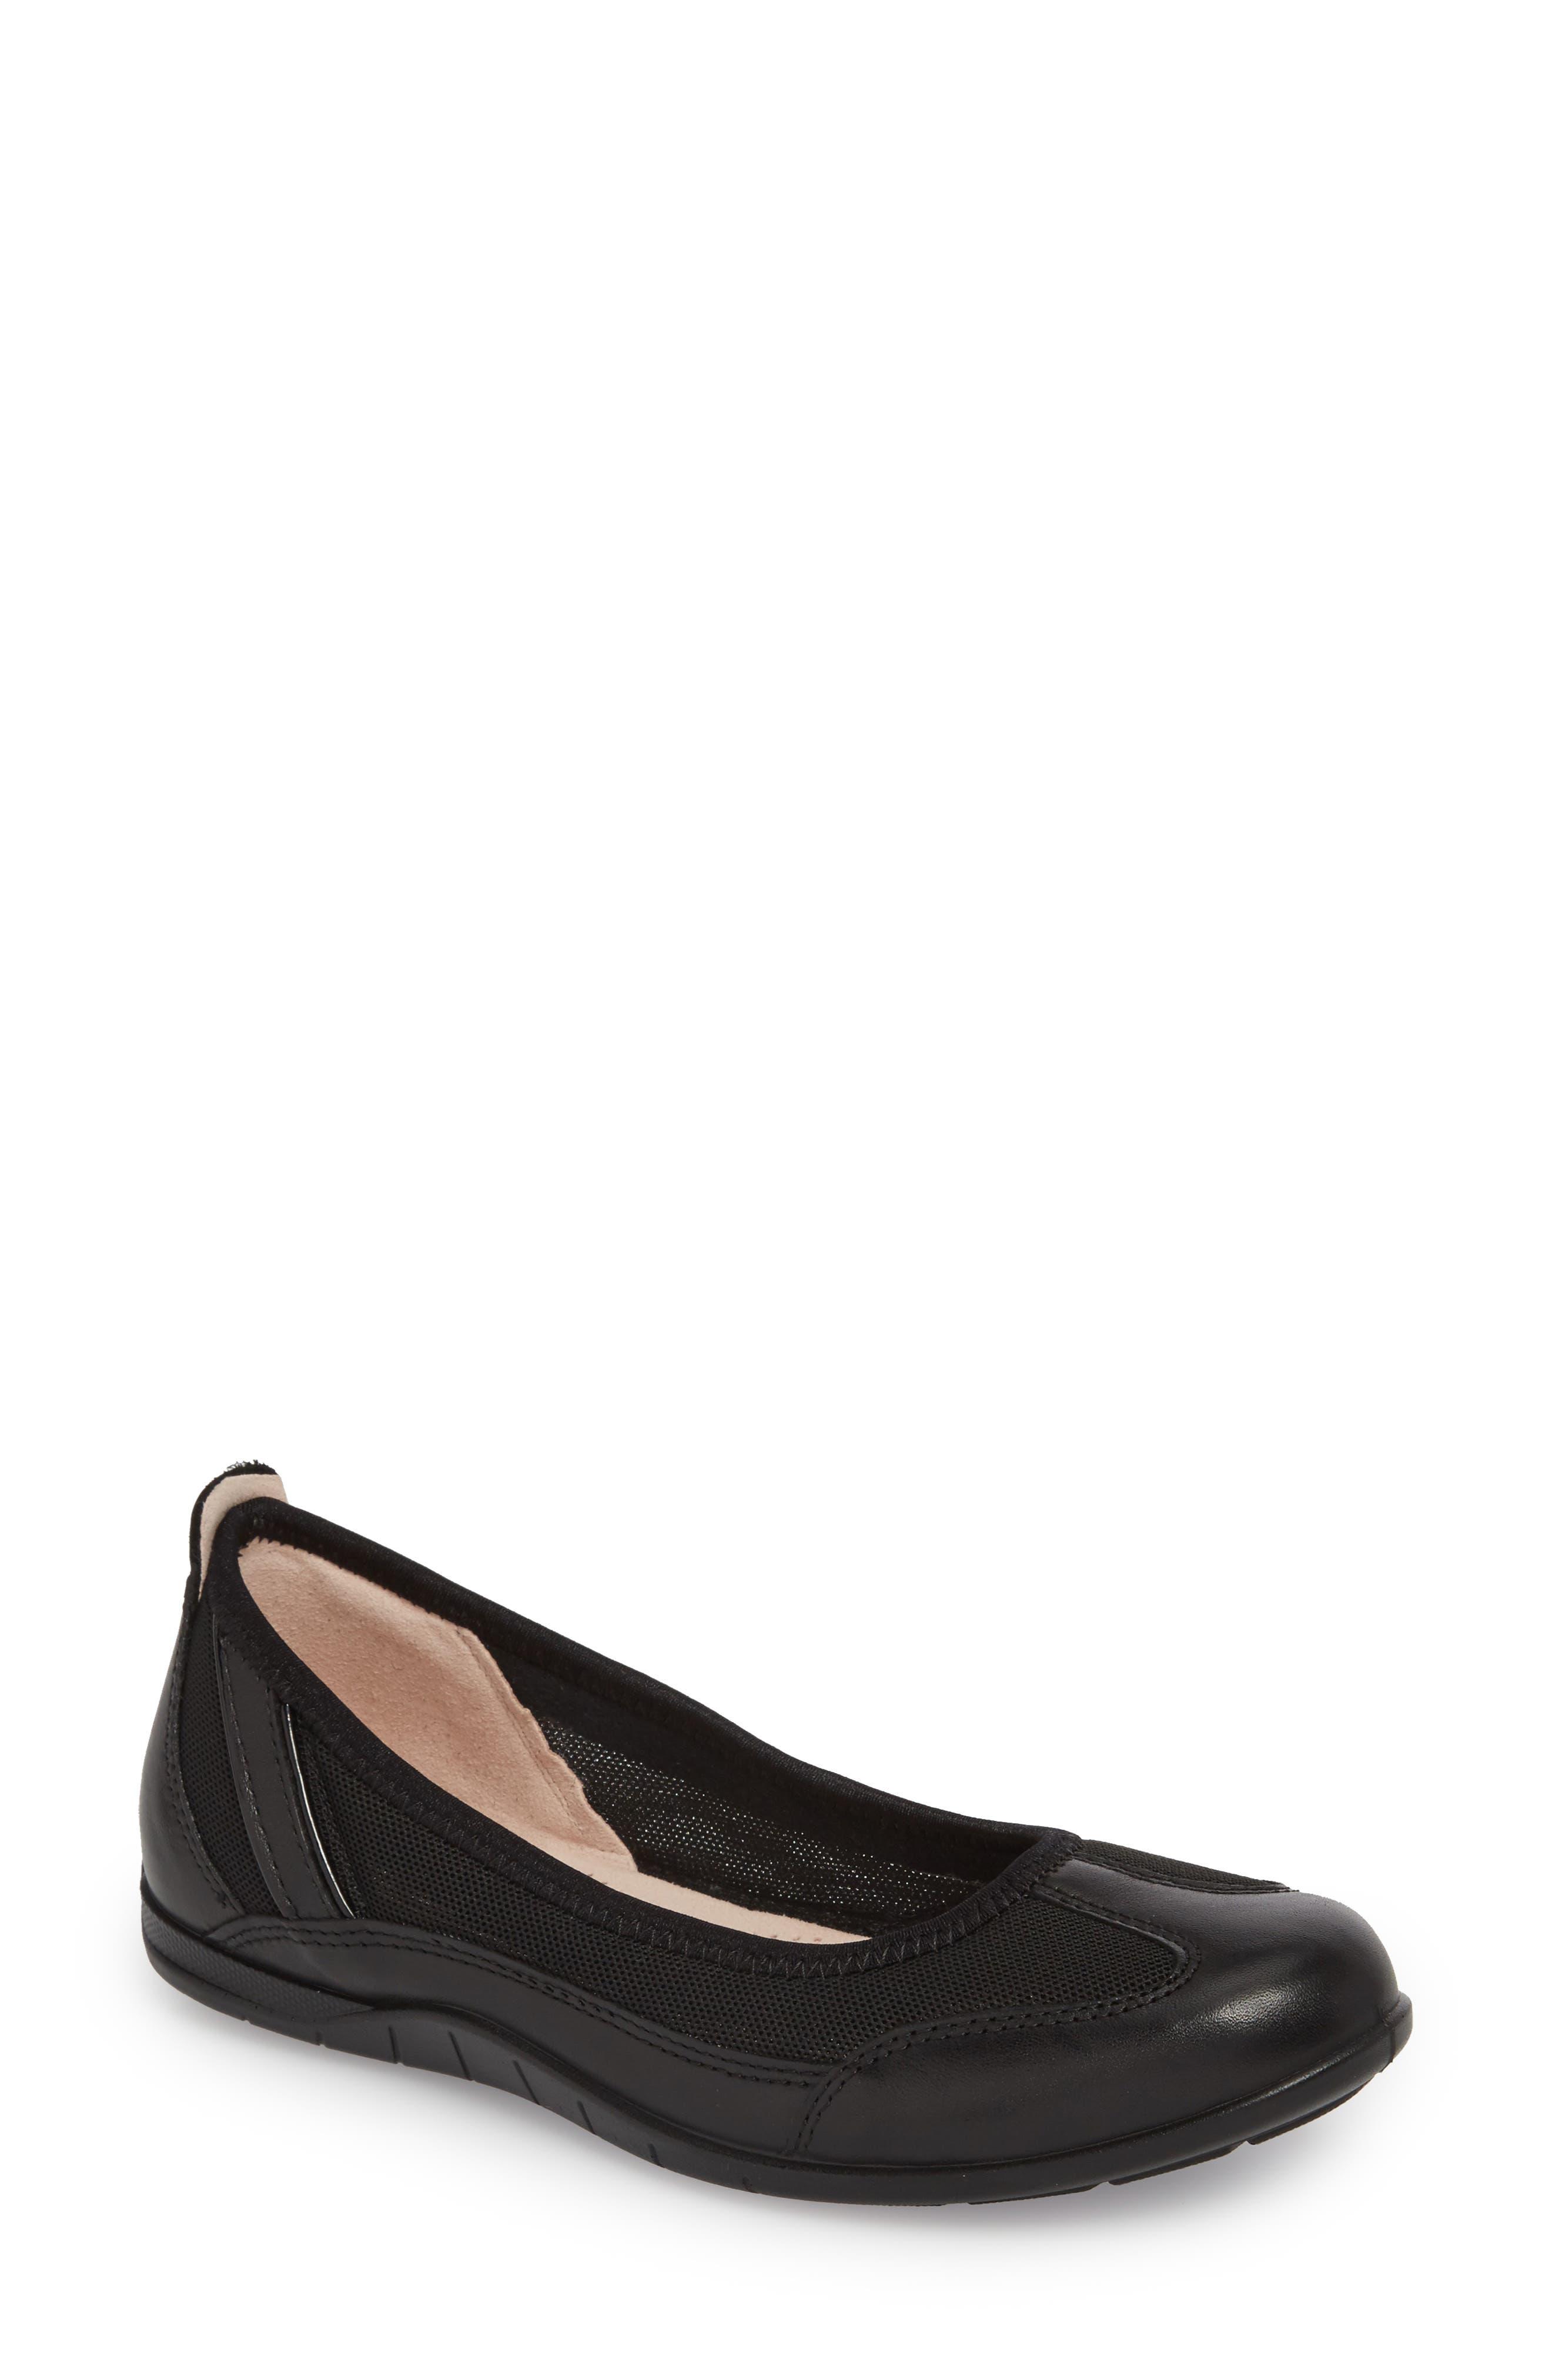 ECCO, 'Bluma' Ballet Sneaker, Main thumbnail 1, color, BLACK LEATHER